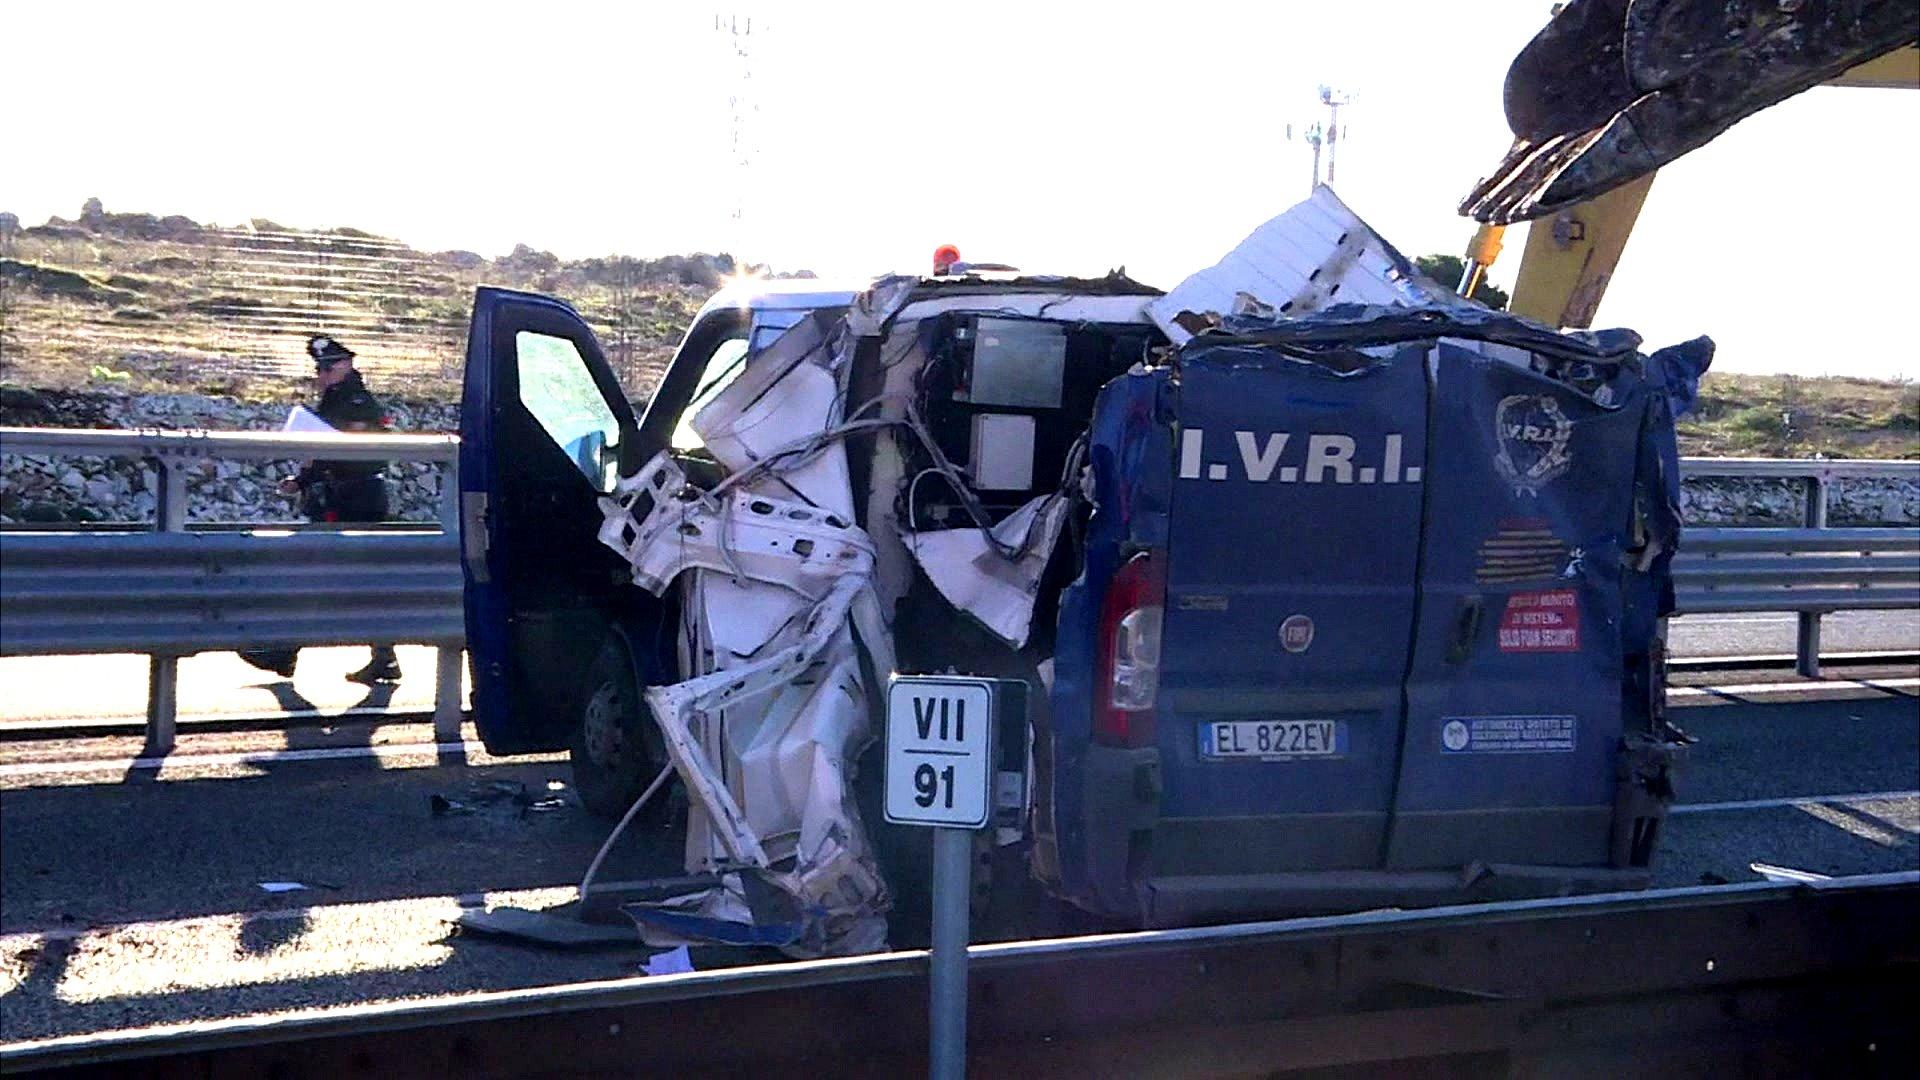 The damaged security van near Bari, southern Italy